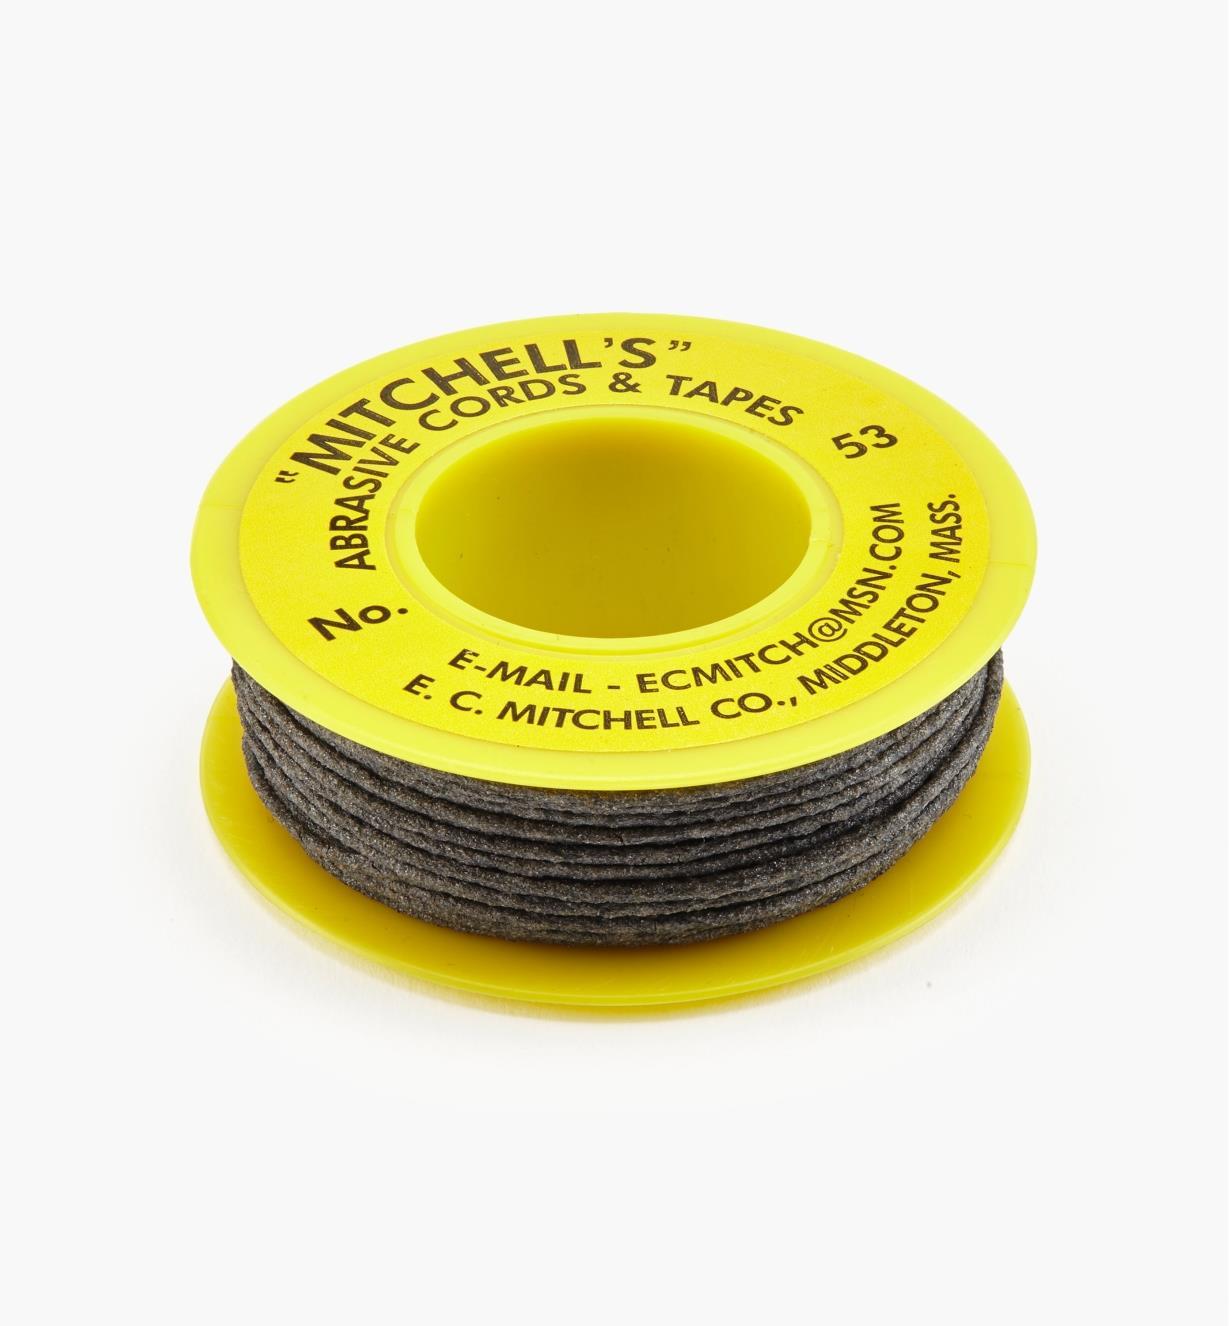 47Z0153 - Corde abrasive no53, 0,040po, de grain180